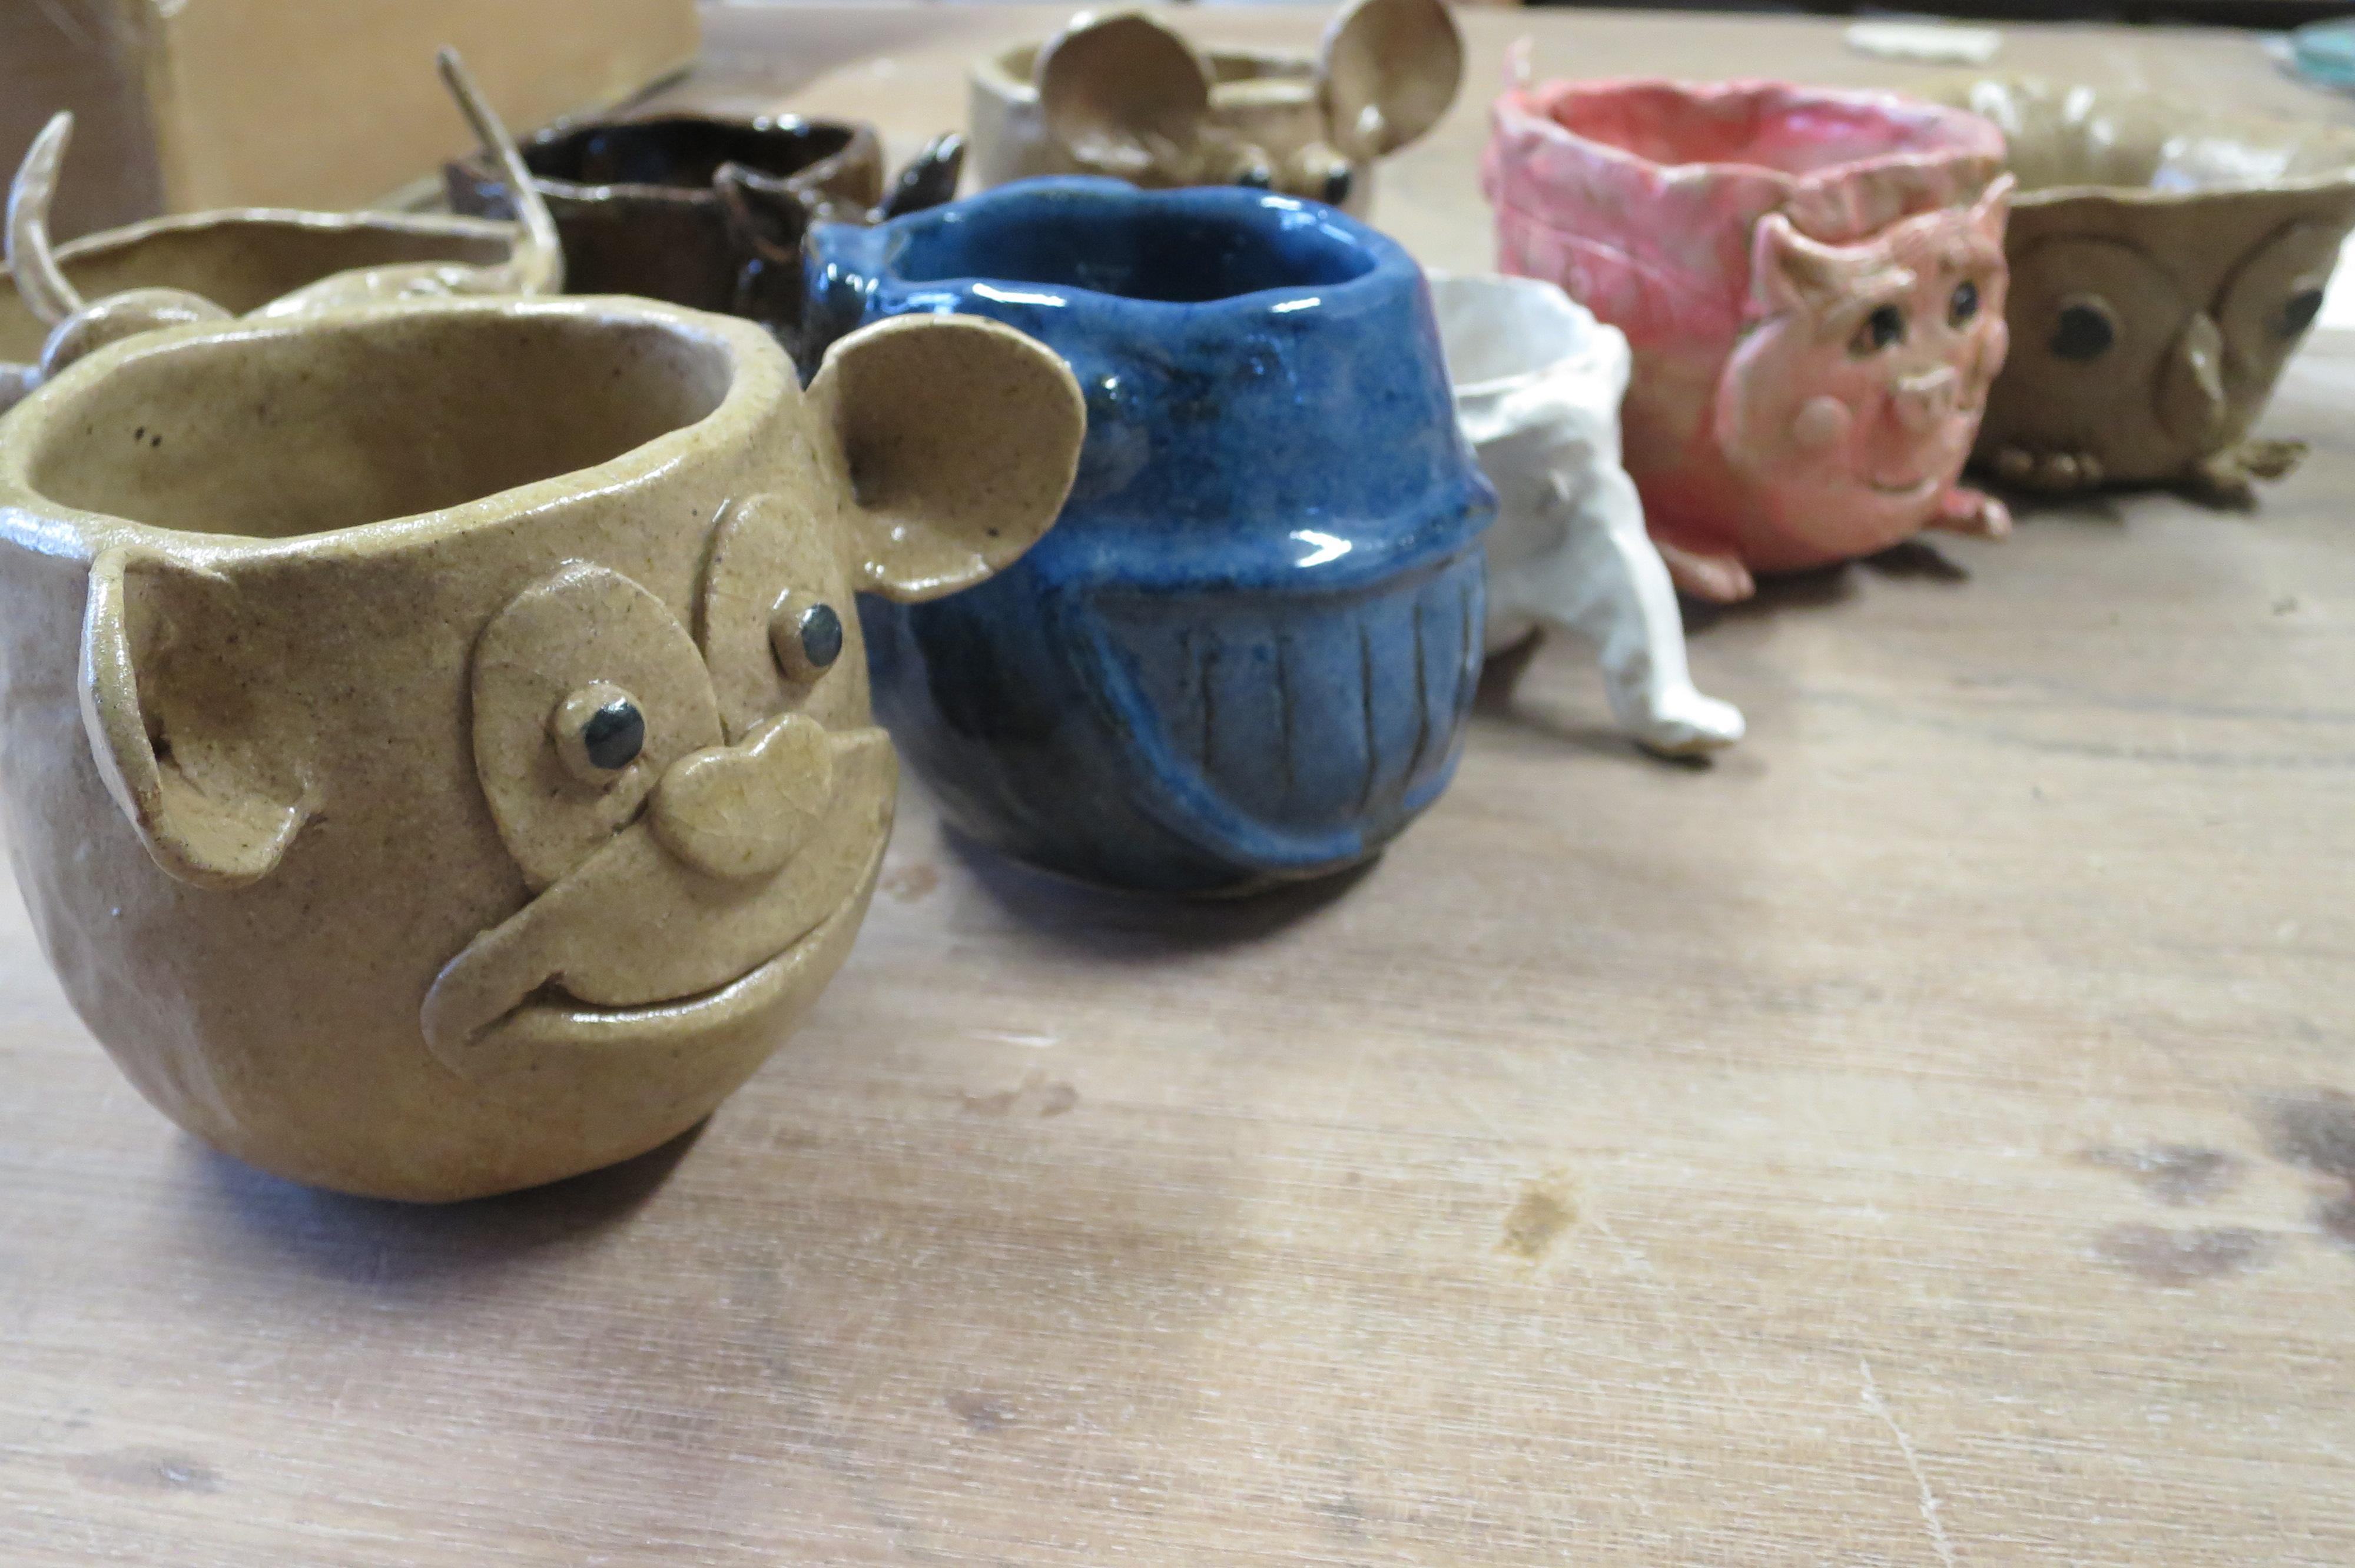 Fun pottery class on Thursday evening